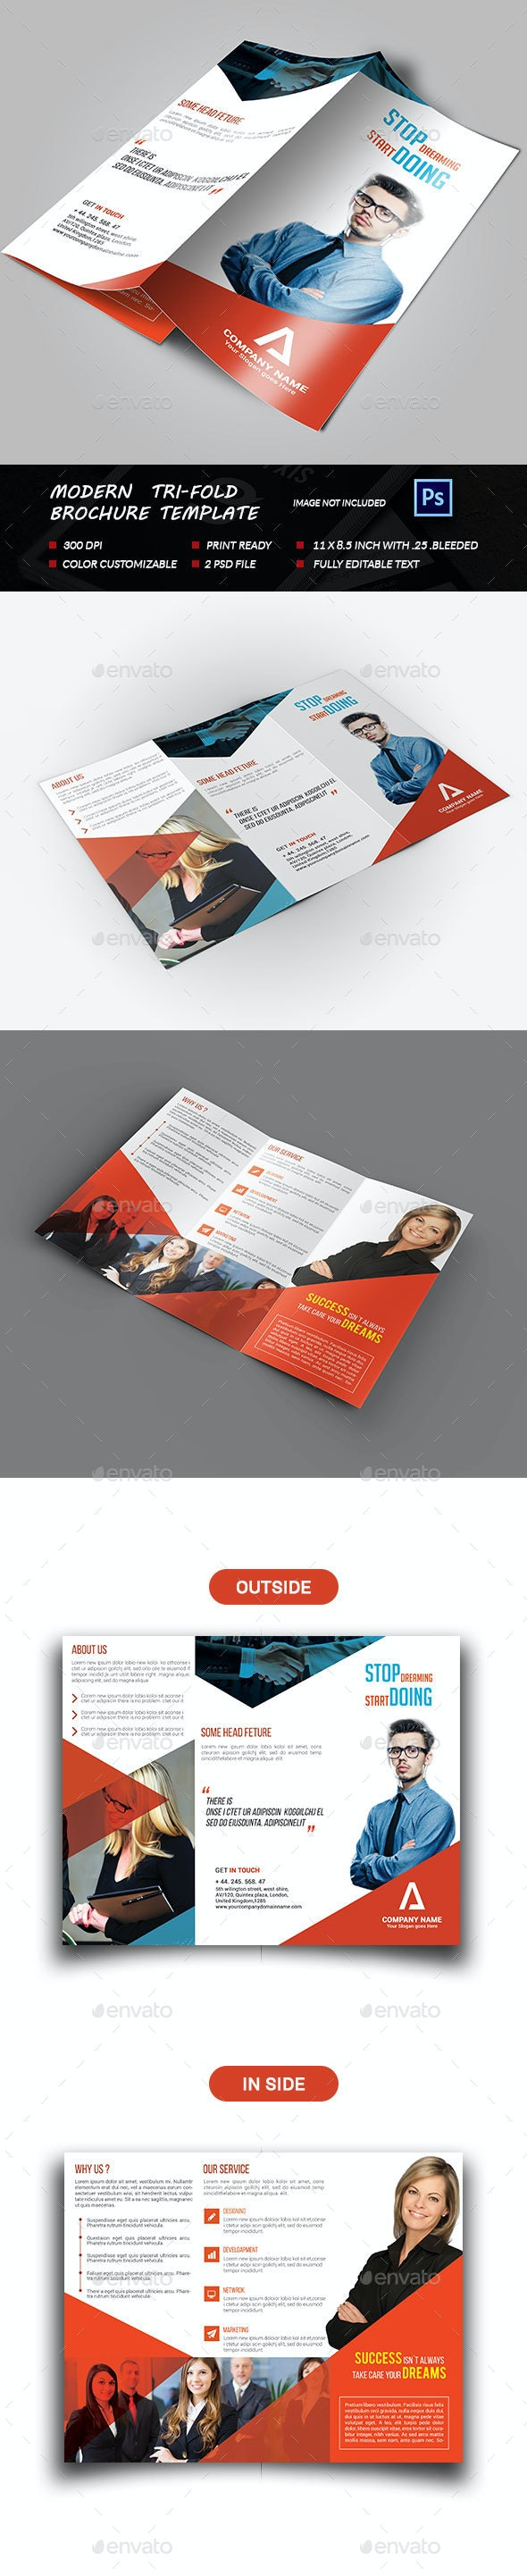 Modern Tri-fold Brochure - Brochures Print Templates